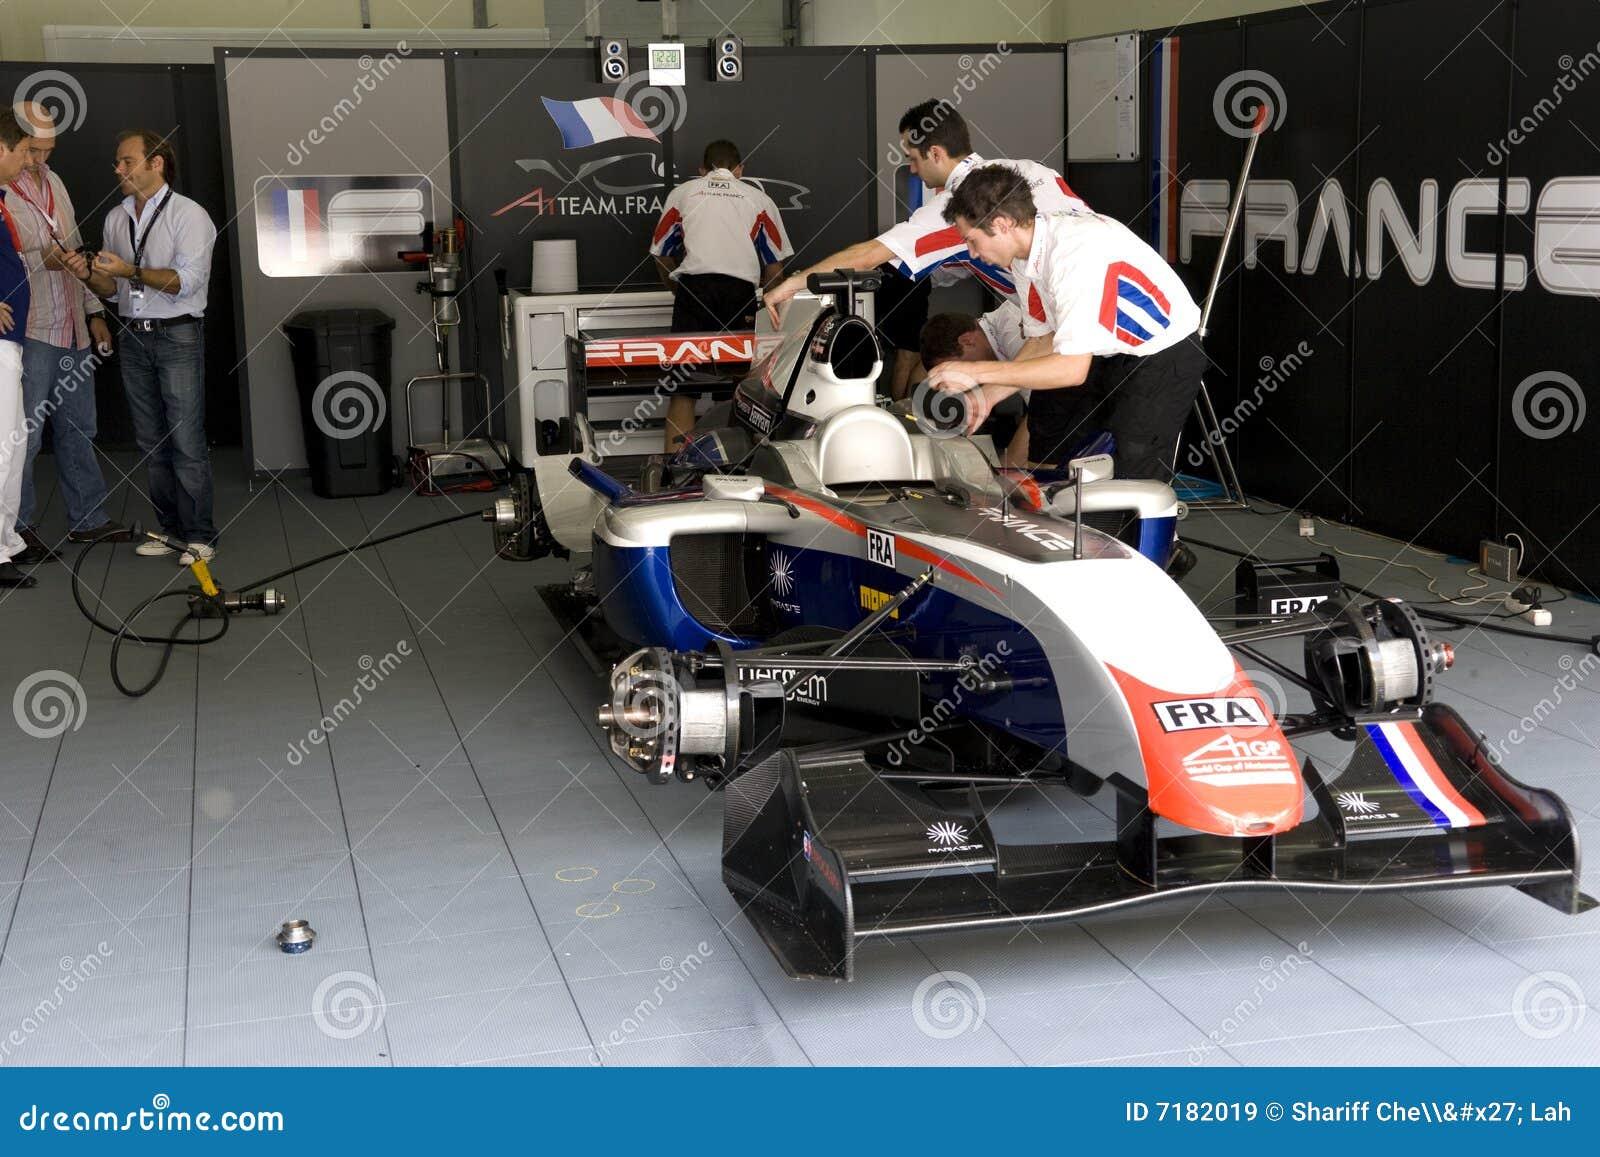 A1GP - Team France Pit Crew Action